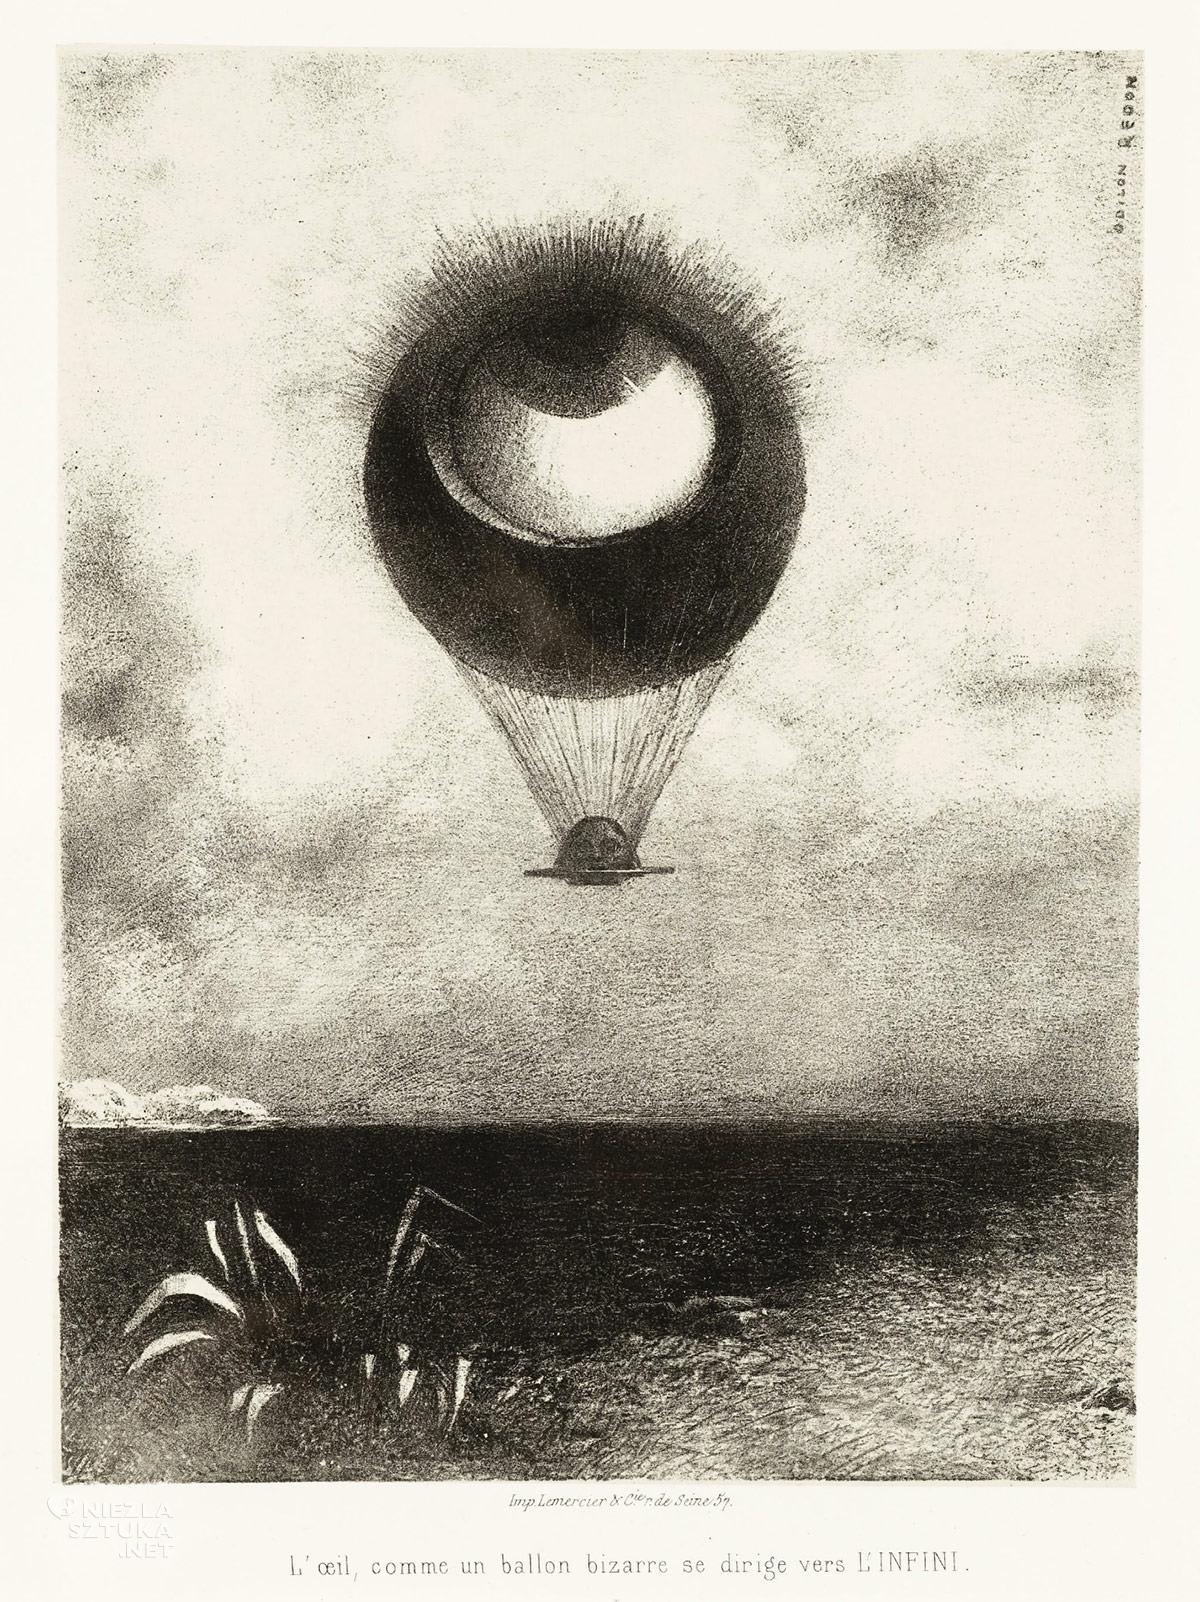 Odilon Redon, Oko balon, symbolizm, litografia, Niezła Sztuka